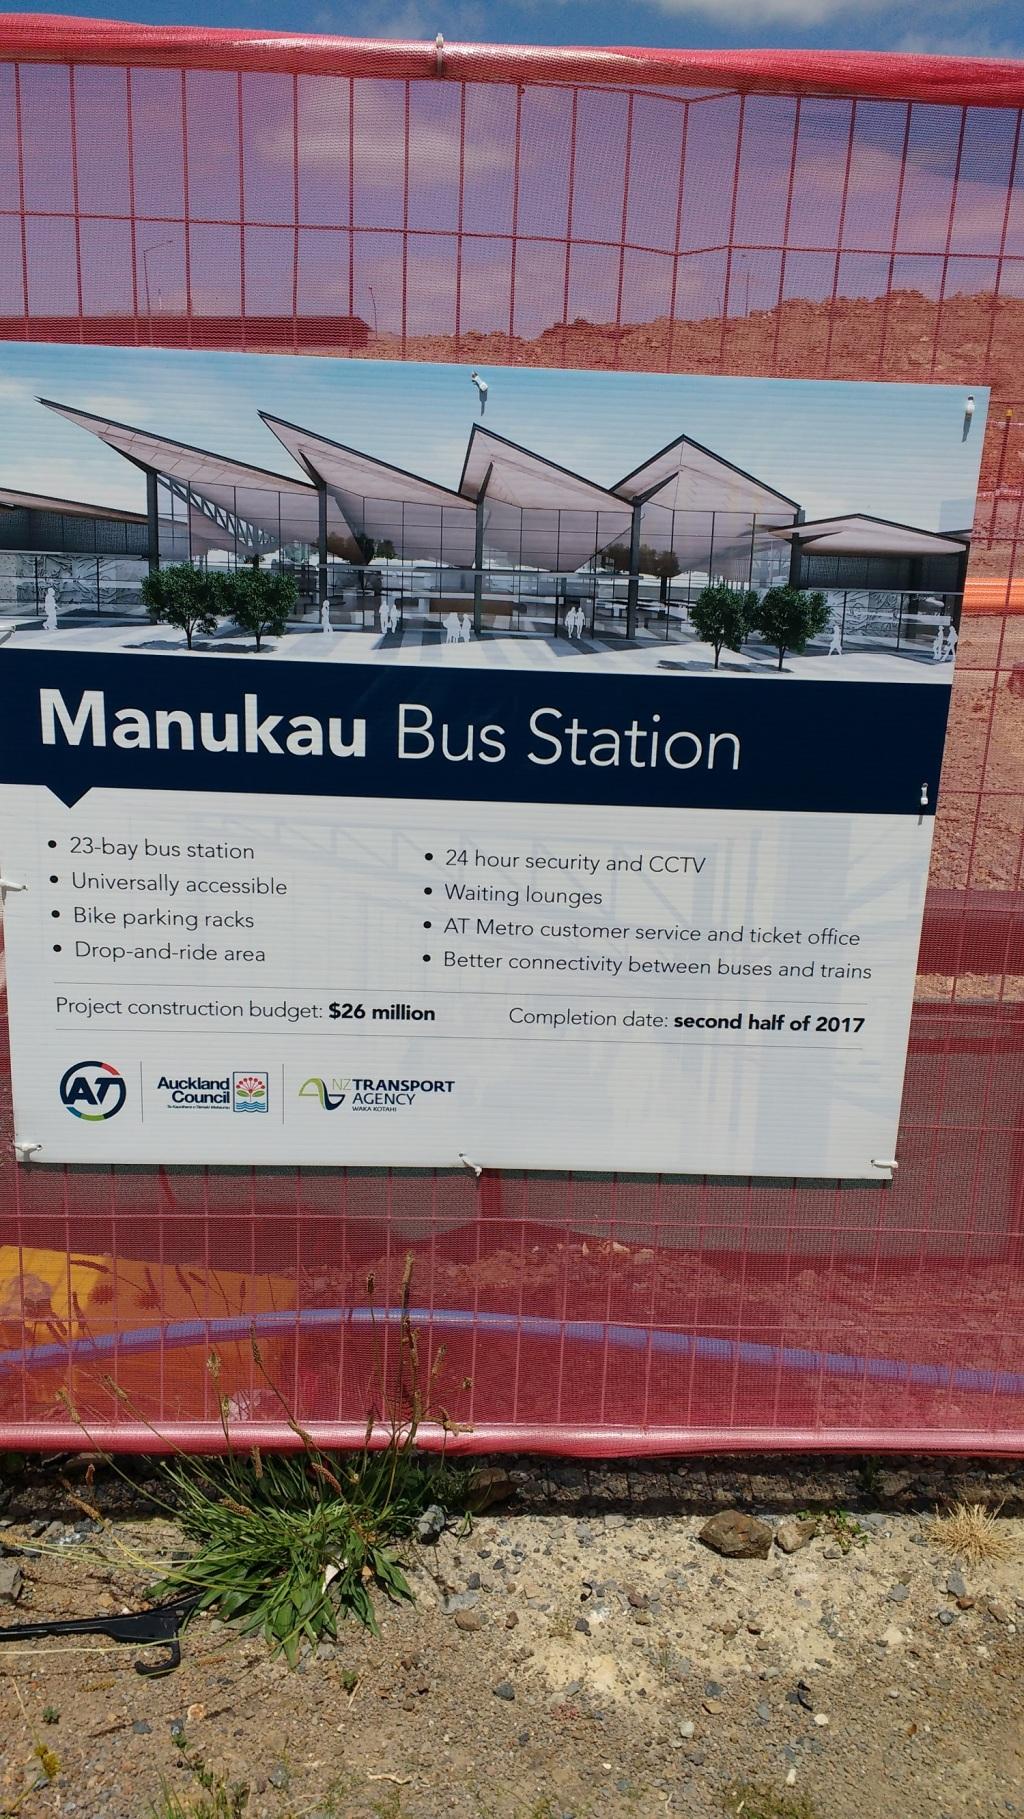 Manukau Bus Station delays